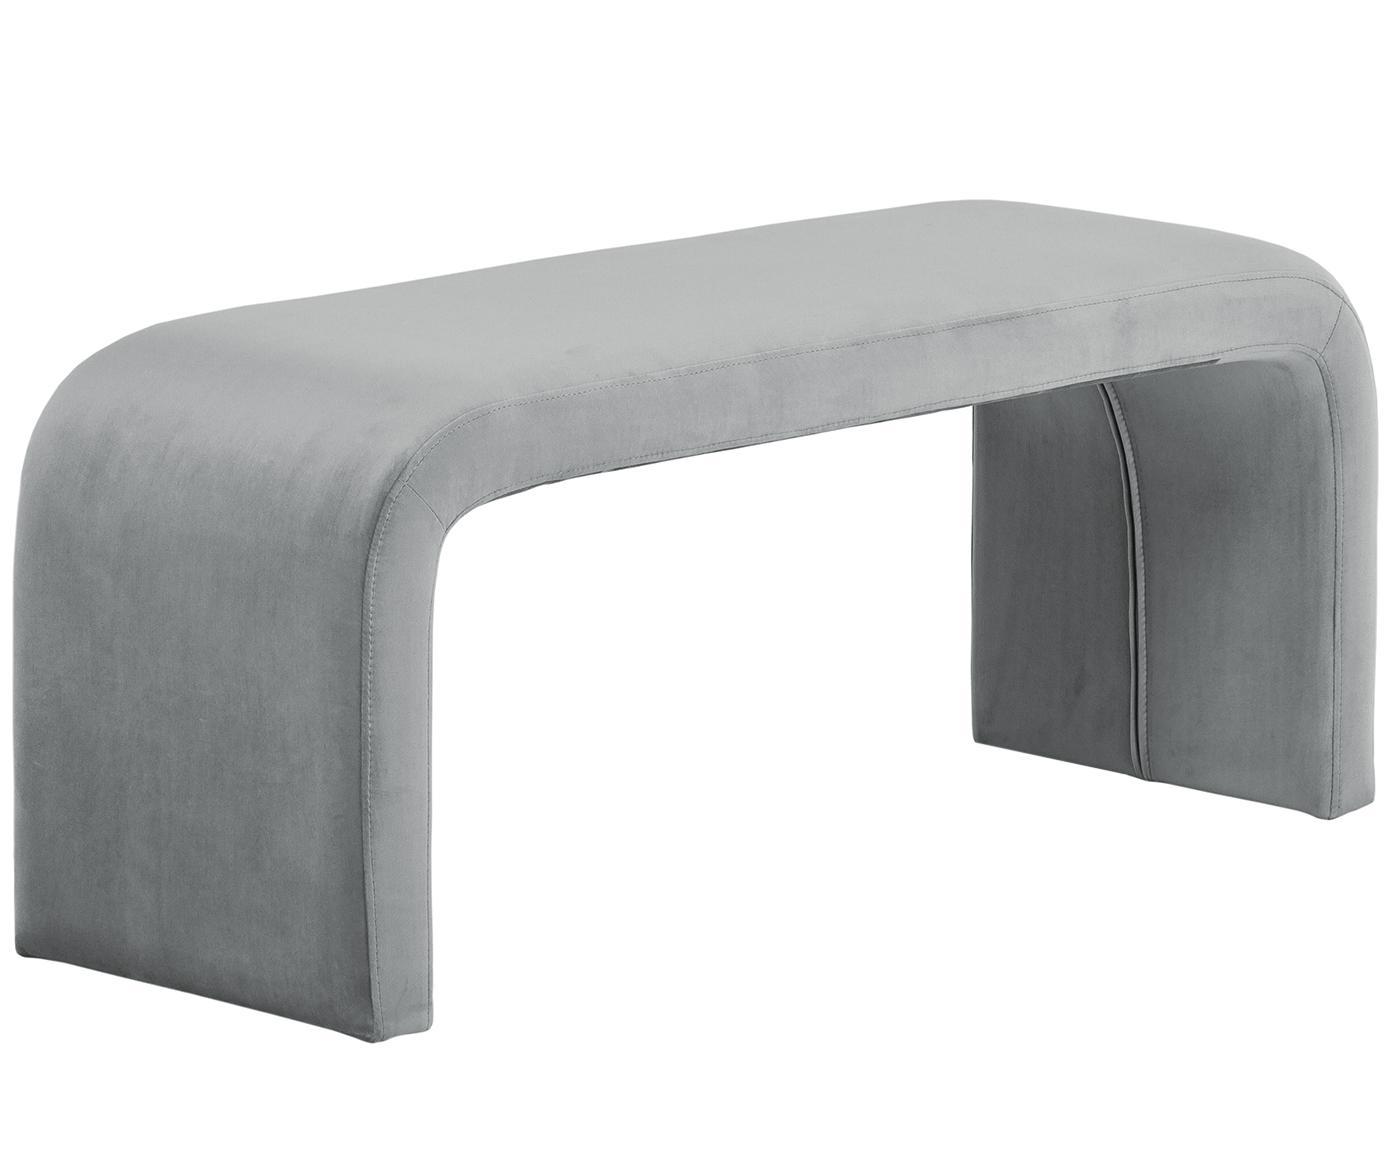 Moderne fluwelen bank Penelope, Bekleding: fluweel (polyester), Frame: metaal, spaanplaat, Grijs, 110 x 45 cm